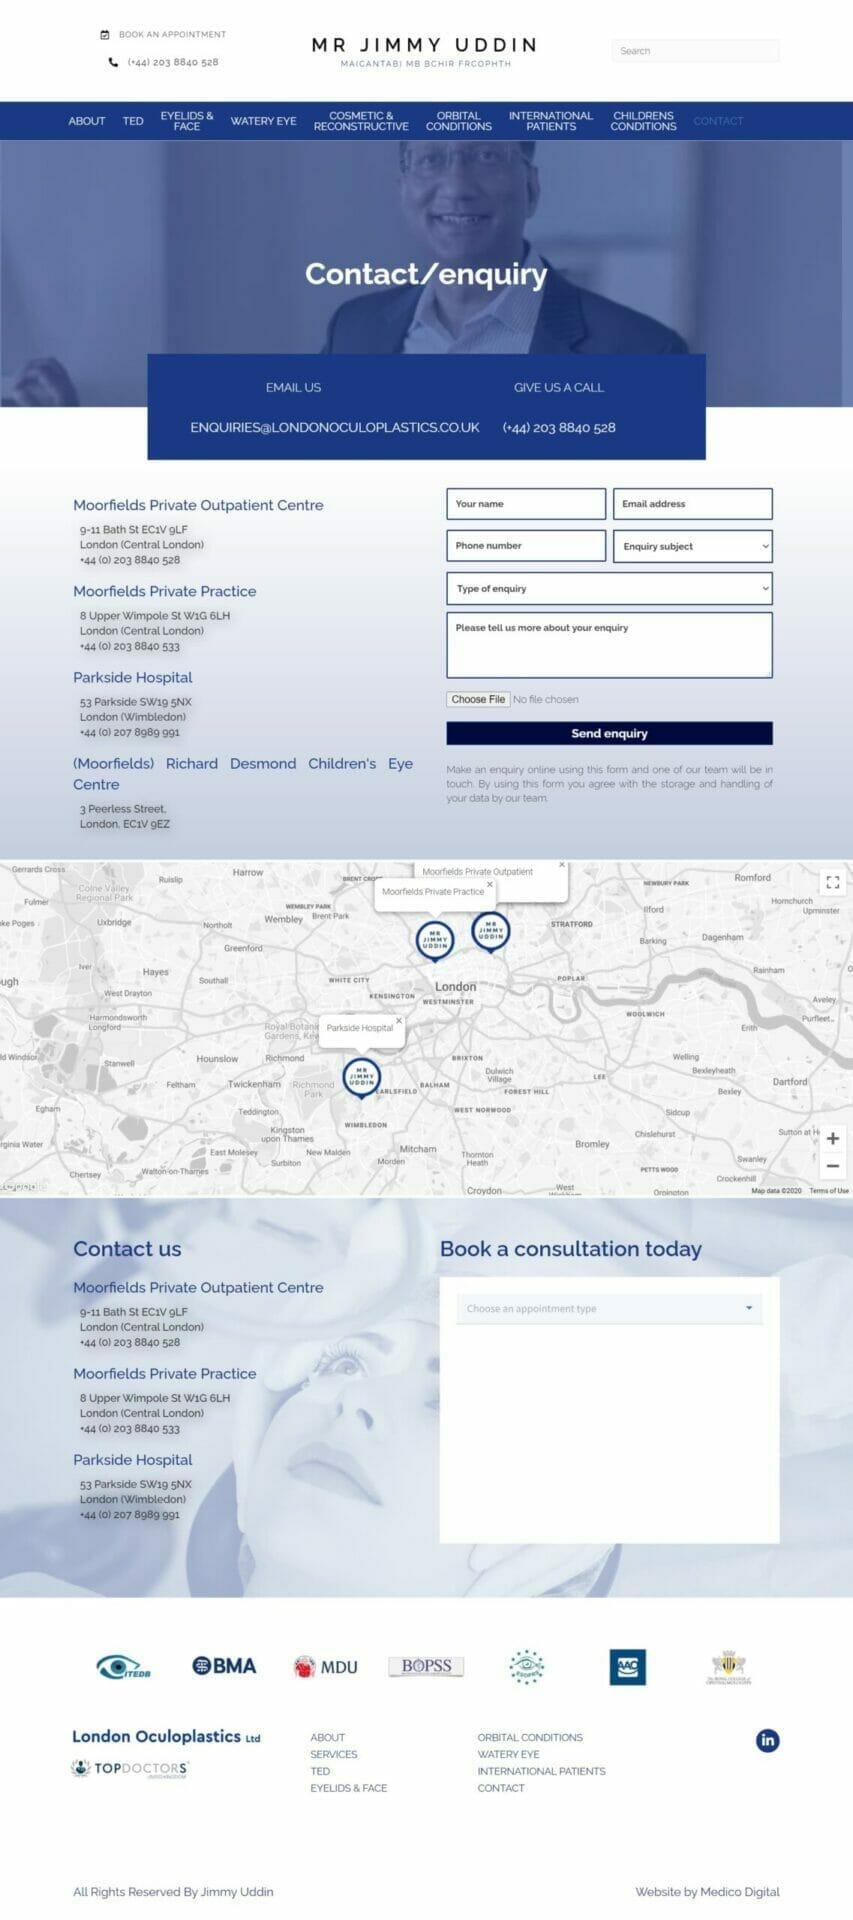 FireShot Capture 972 - Contact - Jimmy Uddin - Oculoplastic Surgeon London_ - londonoculoplastics.co.uk